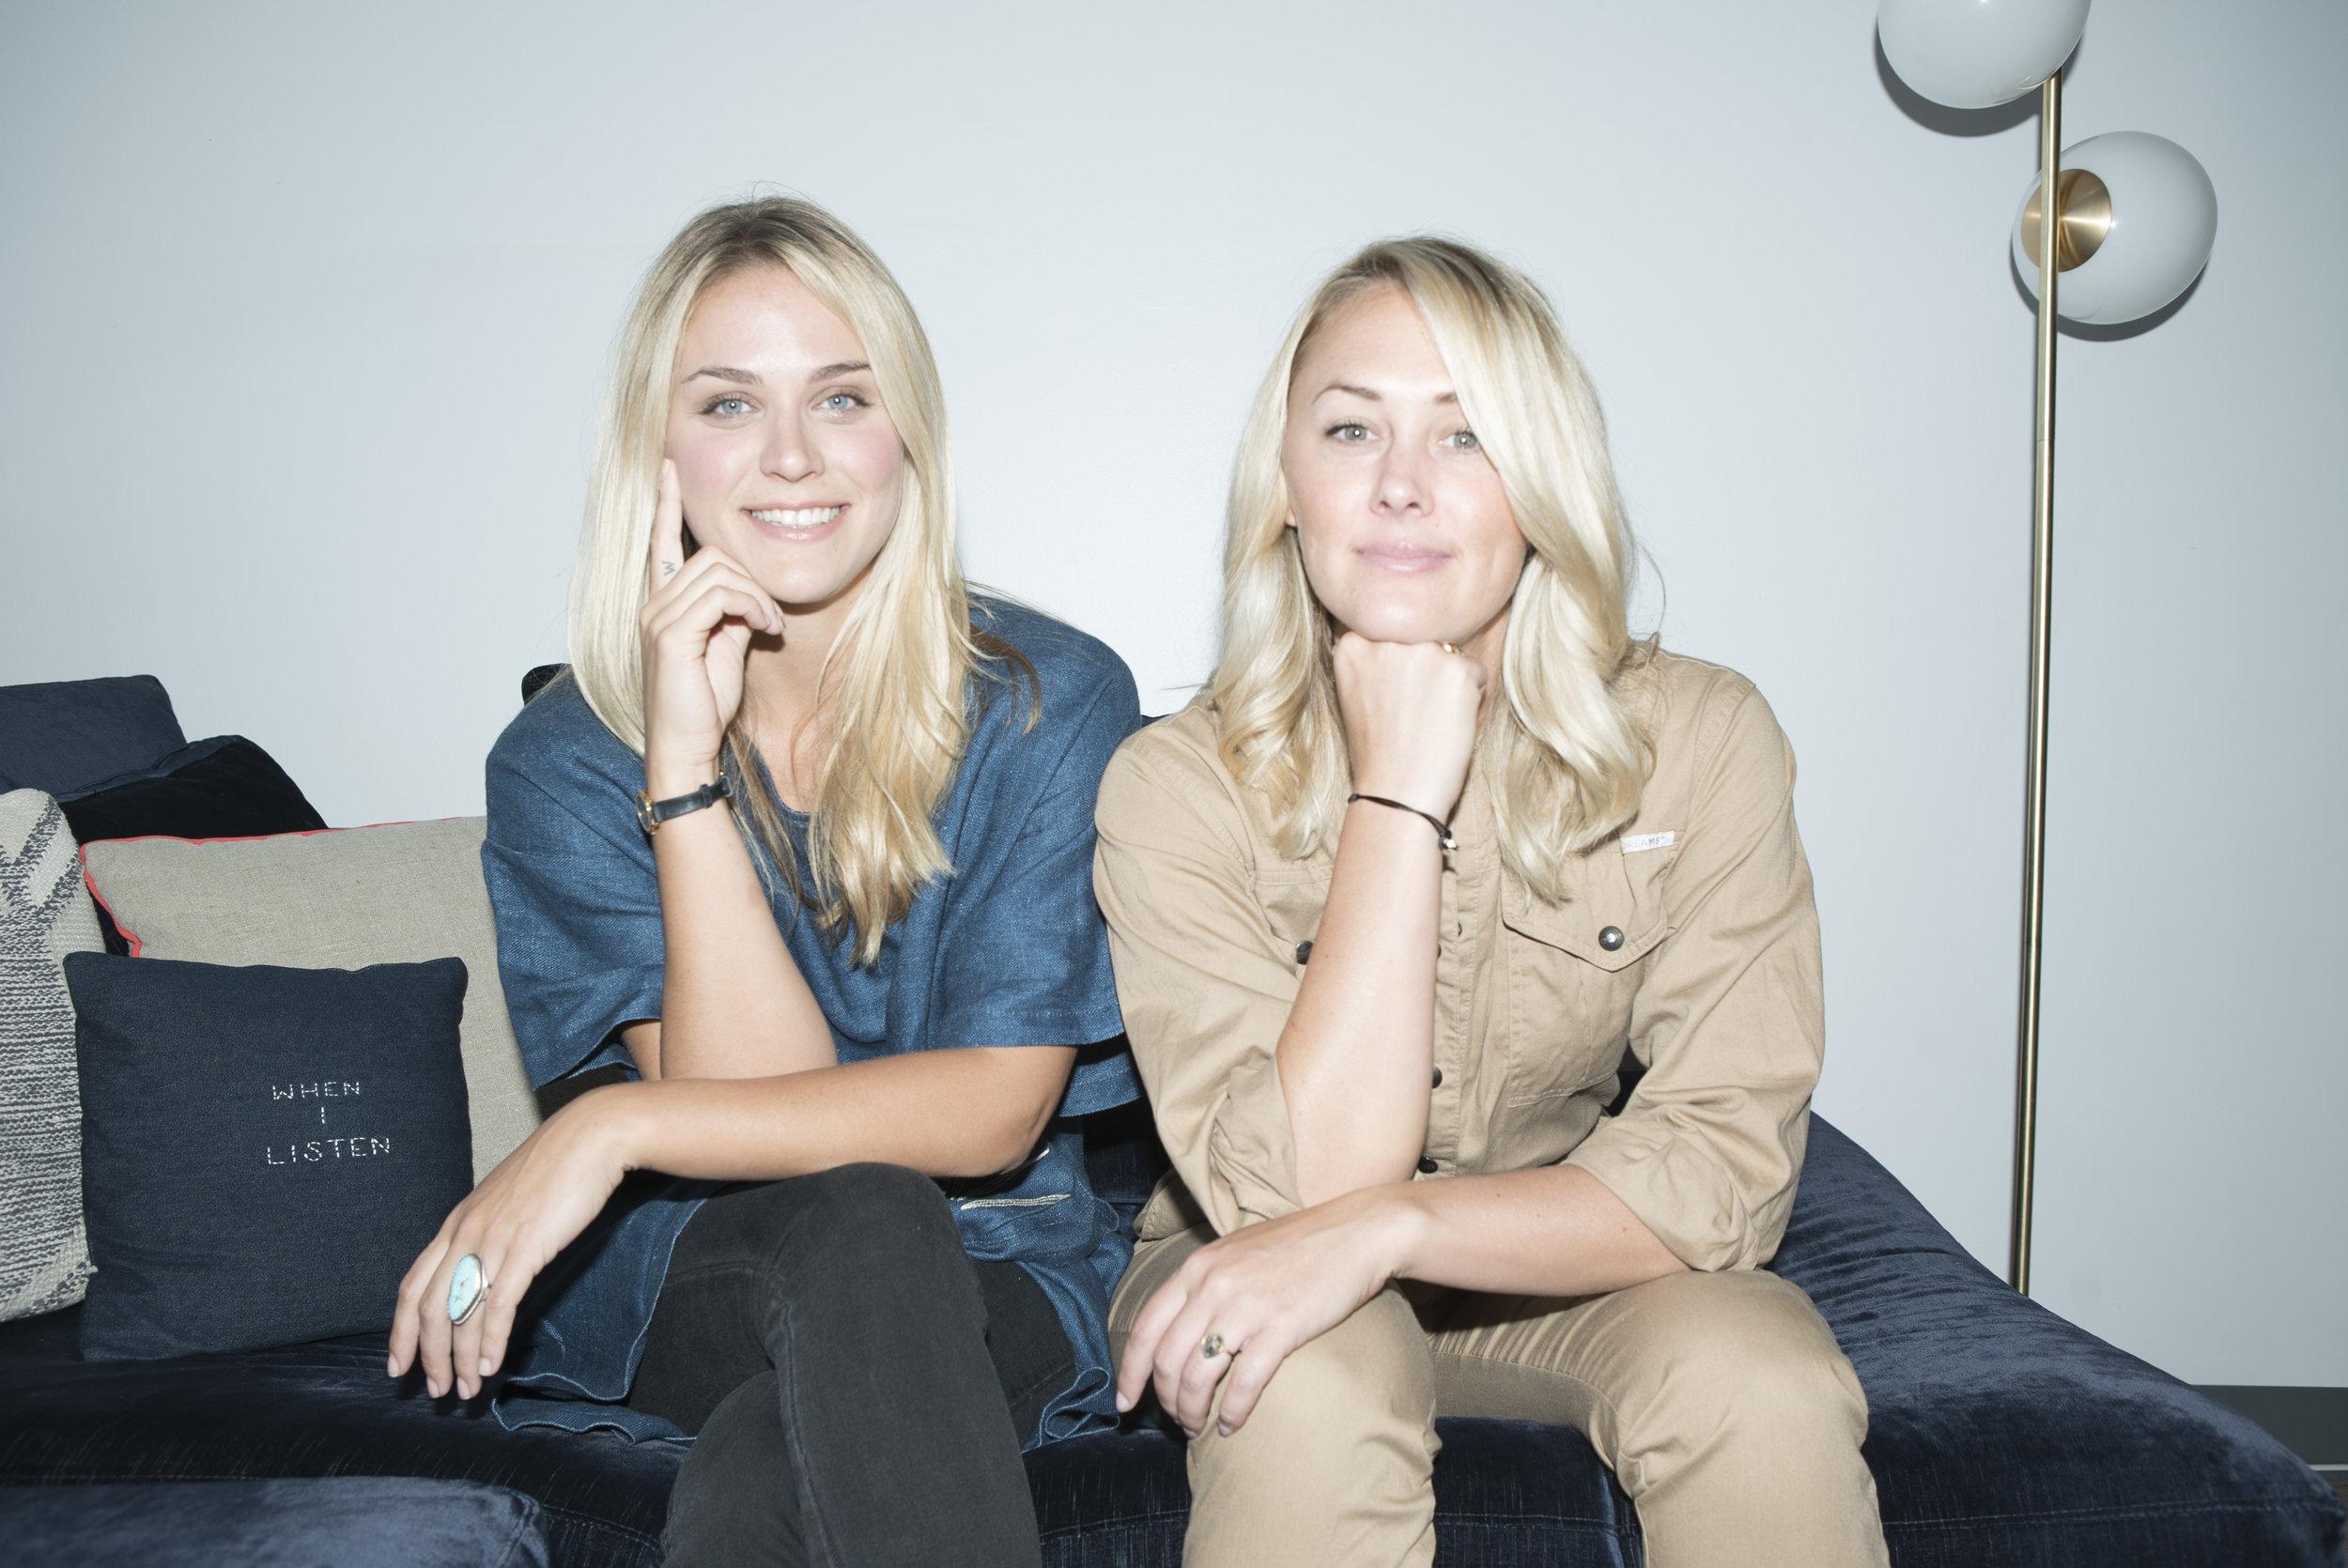 Ashley Sumner and Gianna Wurzl